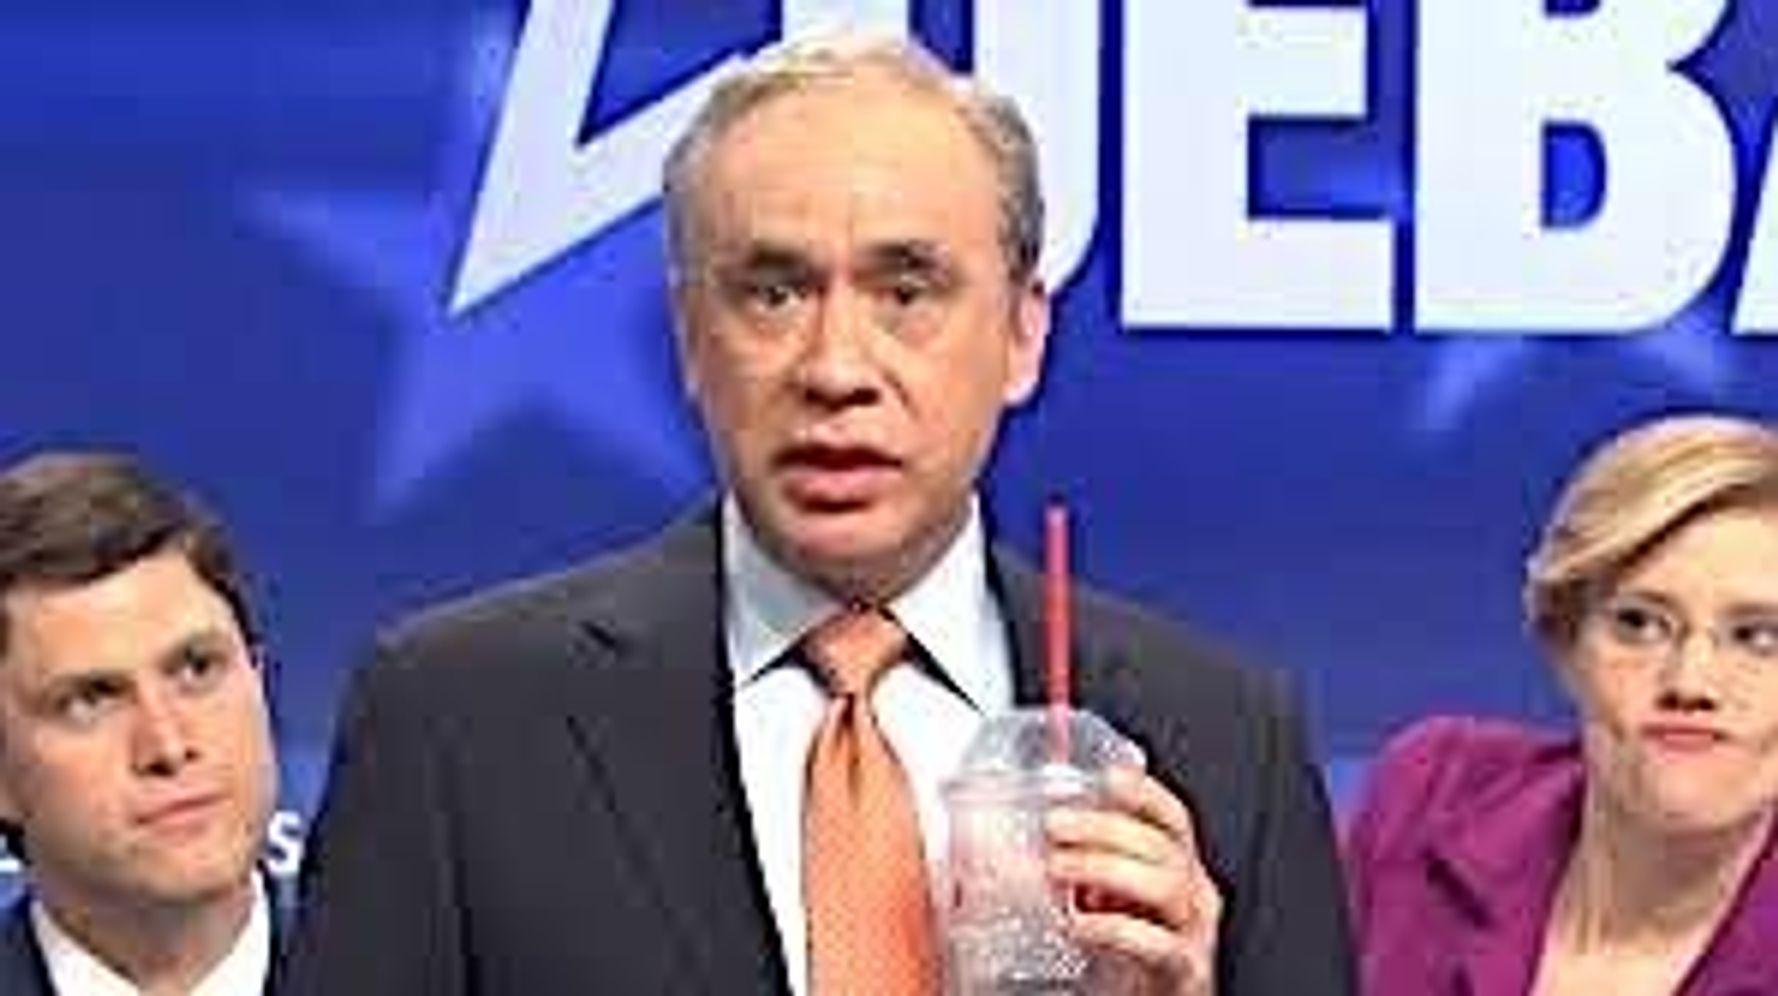 Westlake Legal Group 5dda27bf2500004f19d2e048 Fred Armisen's Bloomberg Tips Doorman $30 Million To Crash Hilarious 'SNL' Dem Debate